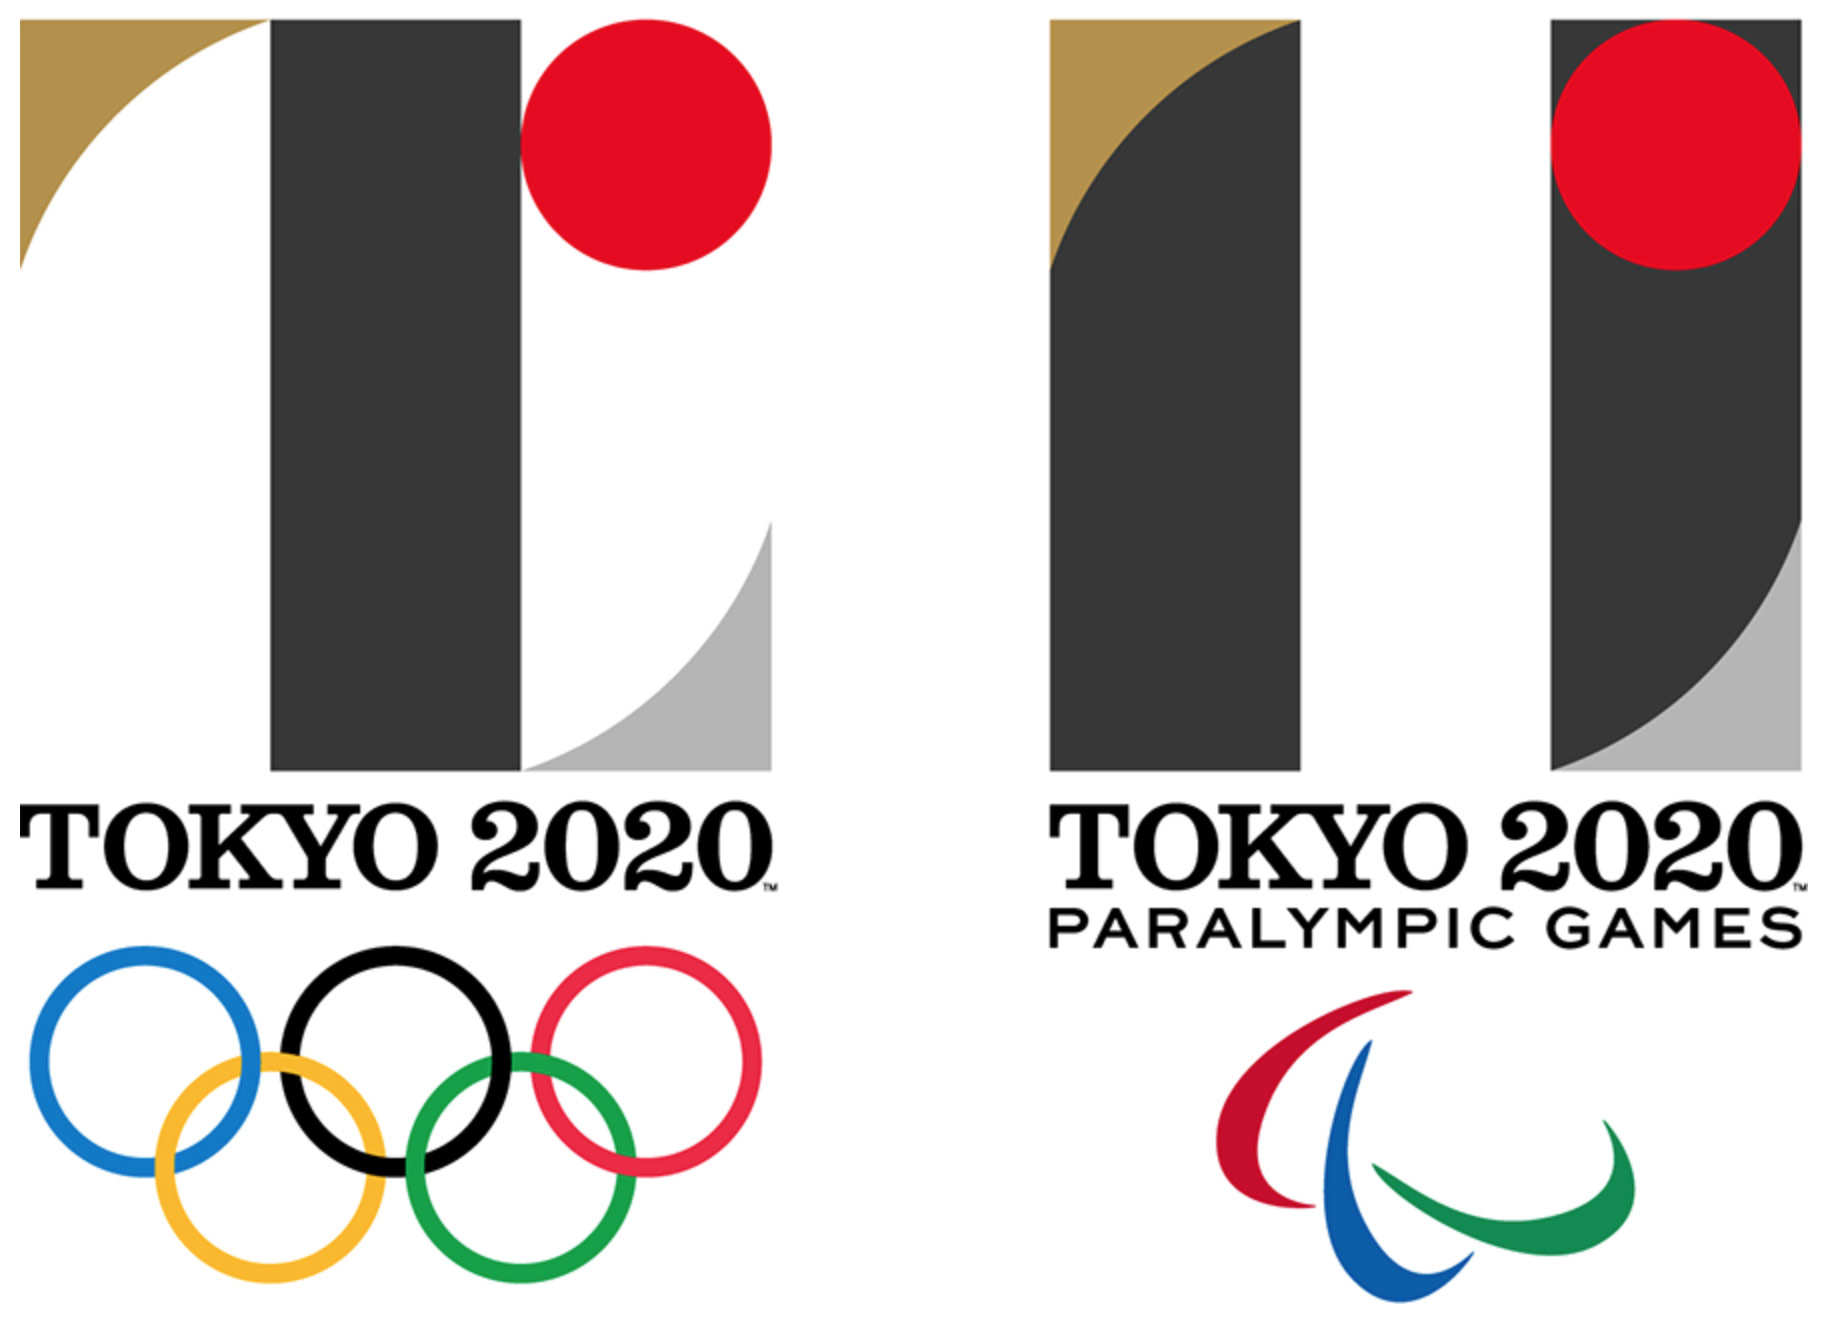 jeux olympiques de tokyo 2020. Black Bedroom Furniture Sets. Home Design Ideas